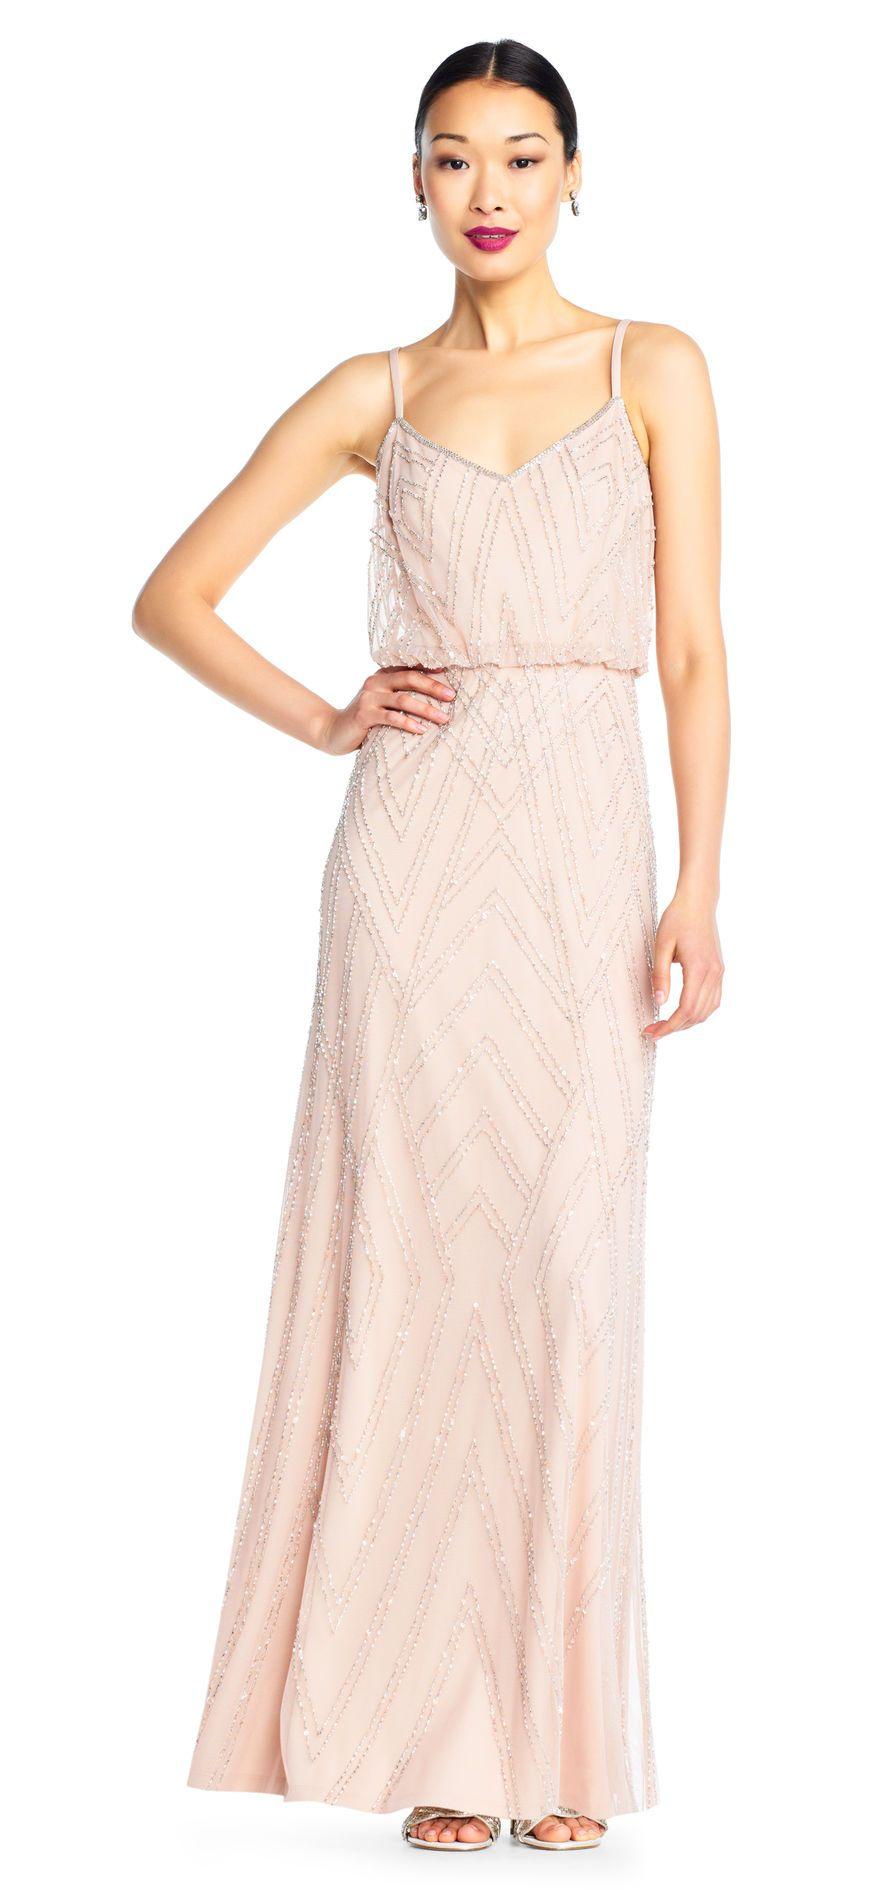 Diamond beaded blouson dress bridesmaids dresses pinterest